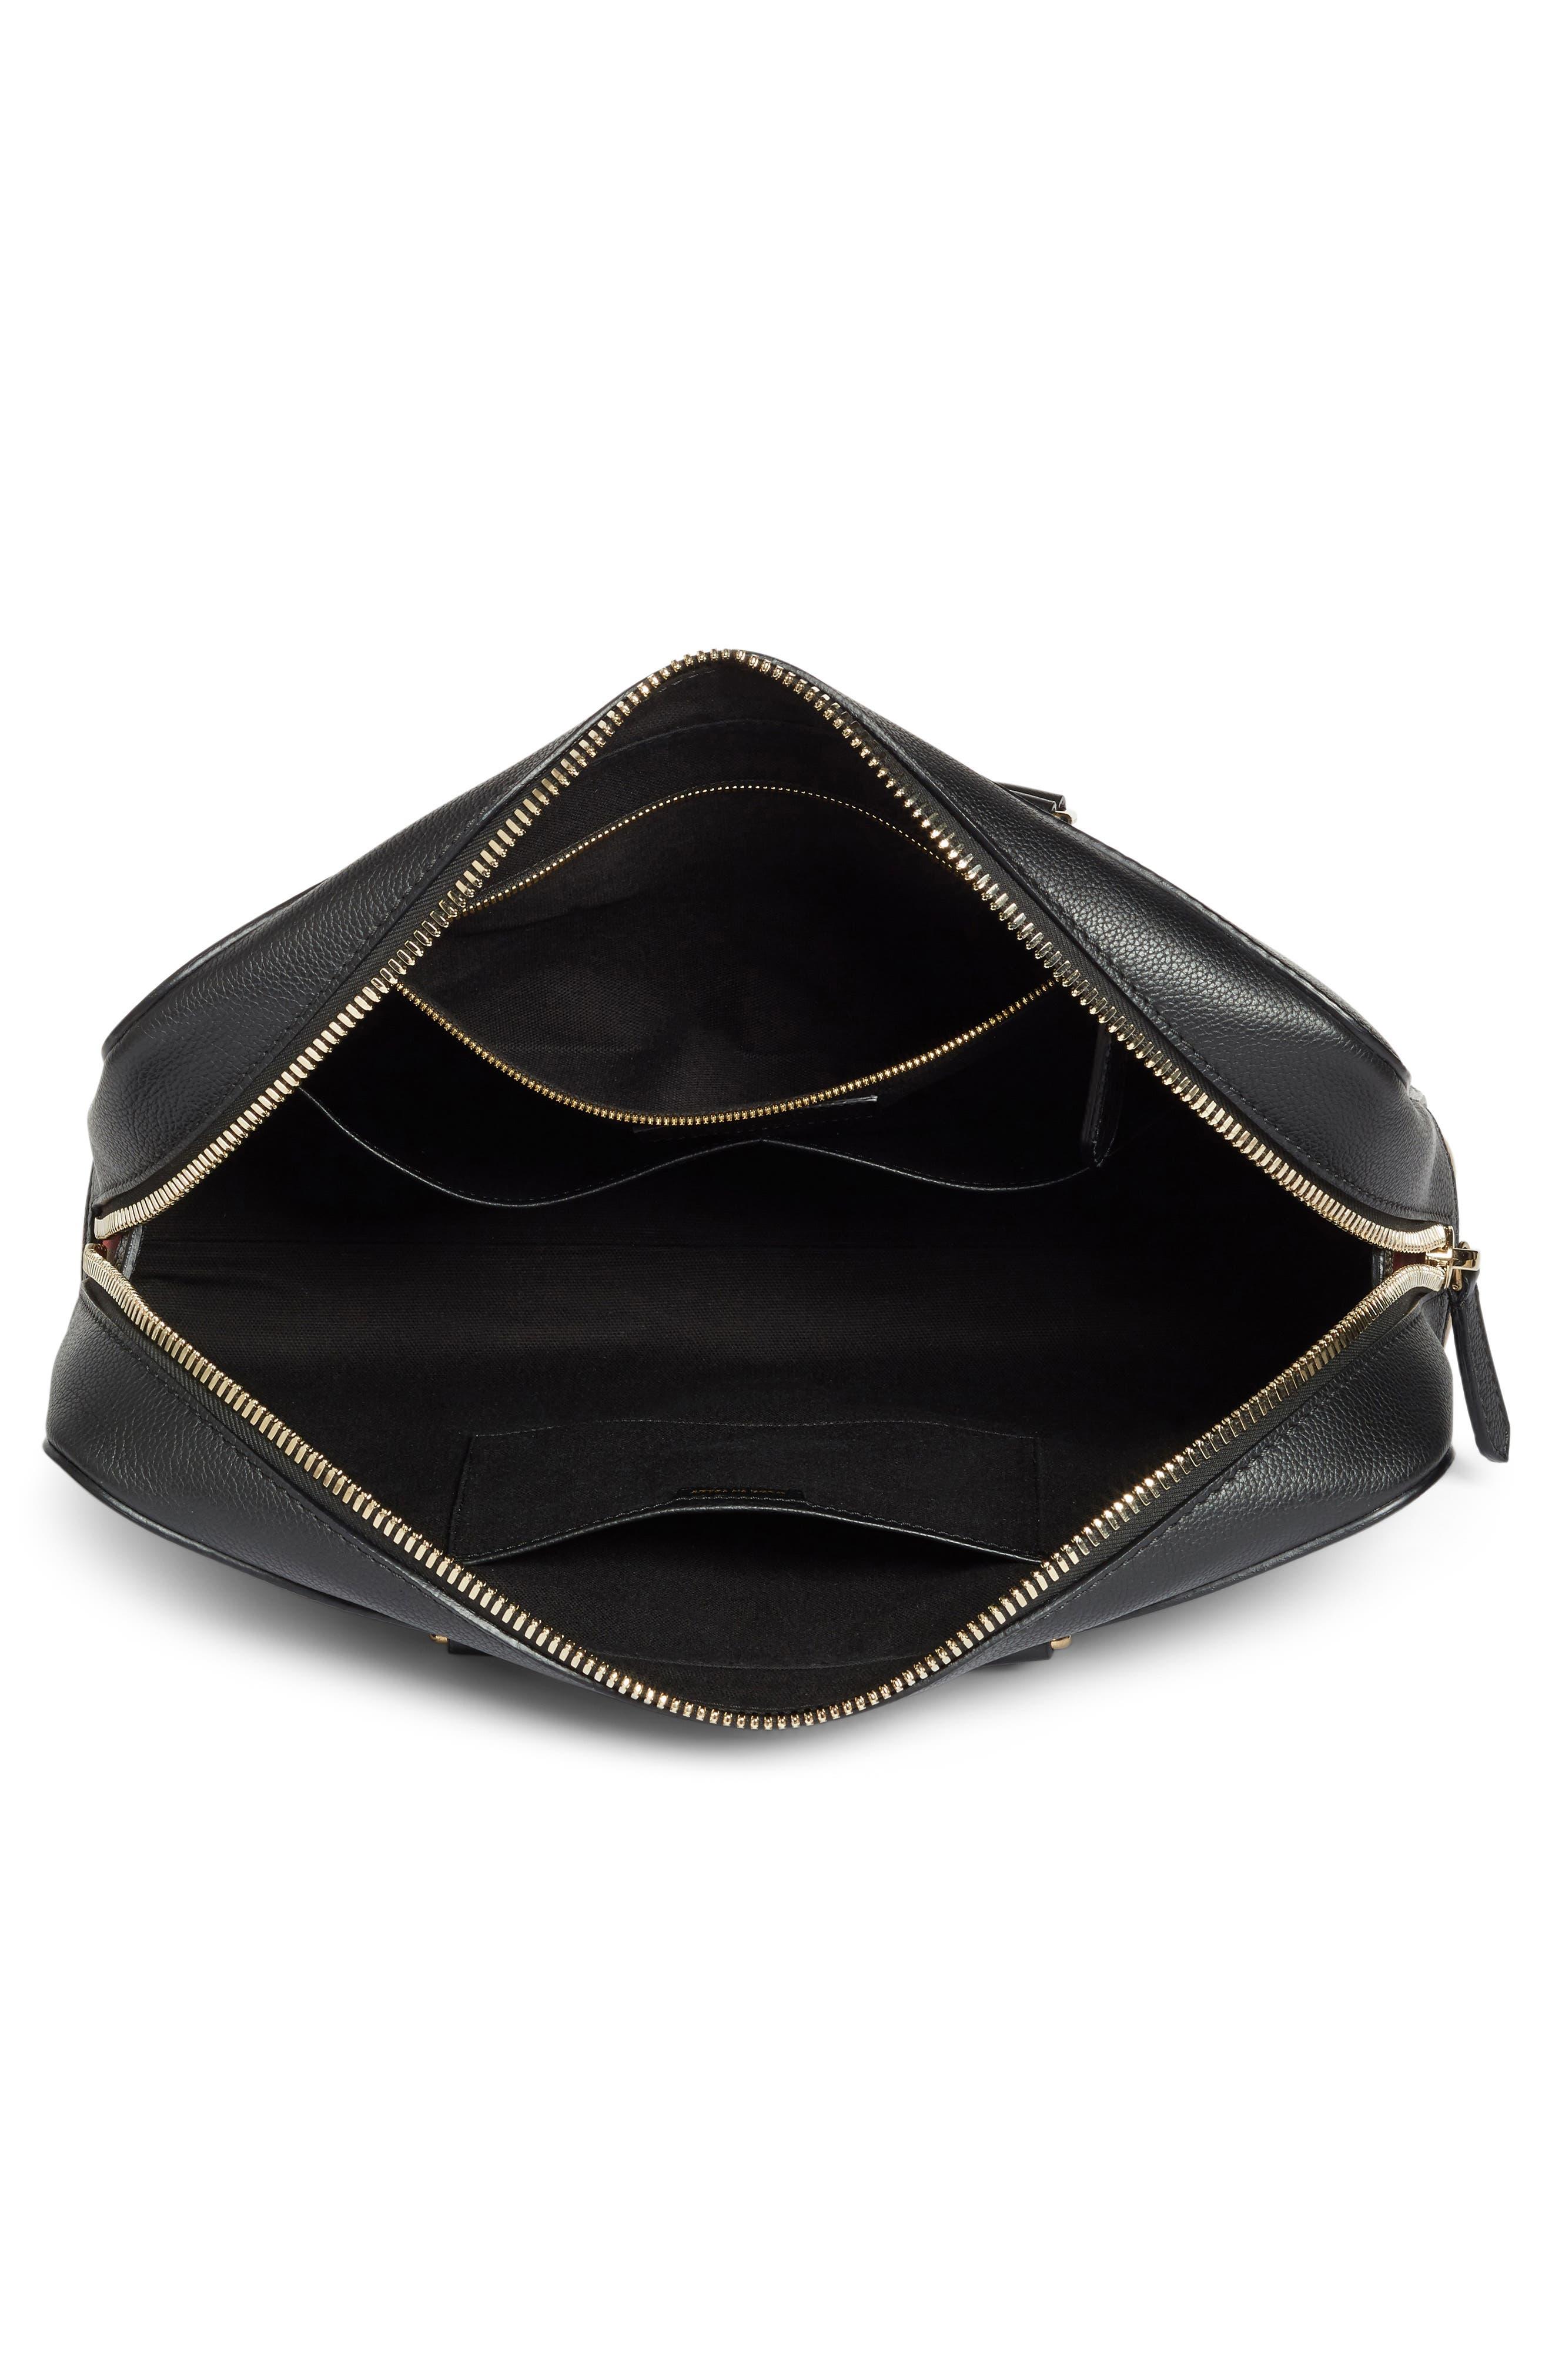 Horton Leather Briefcase,                             Alternate thumbnail 4, color,                             001